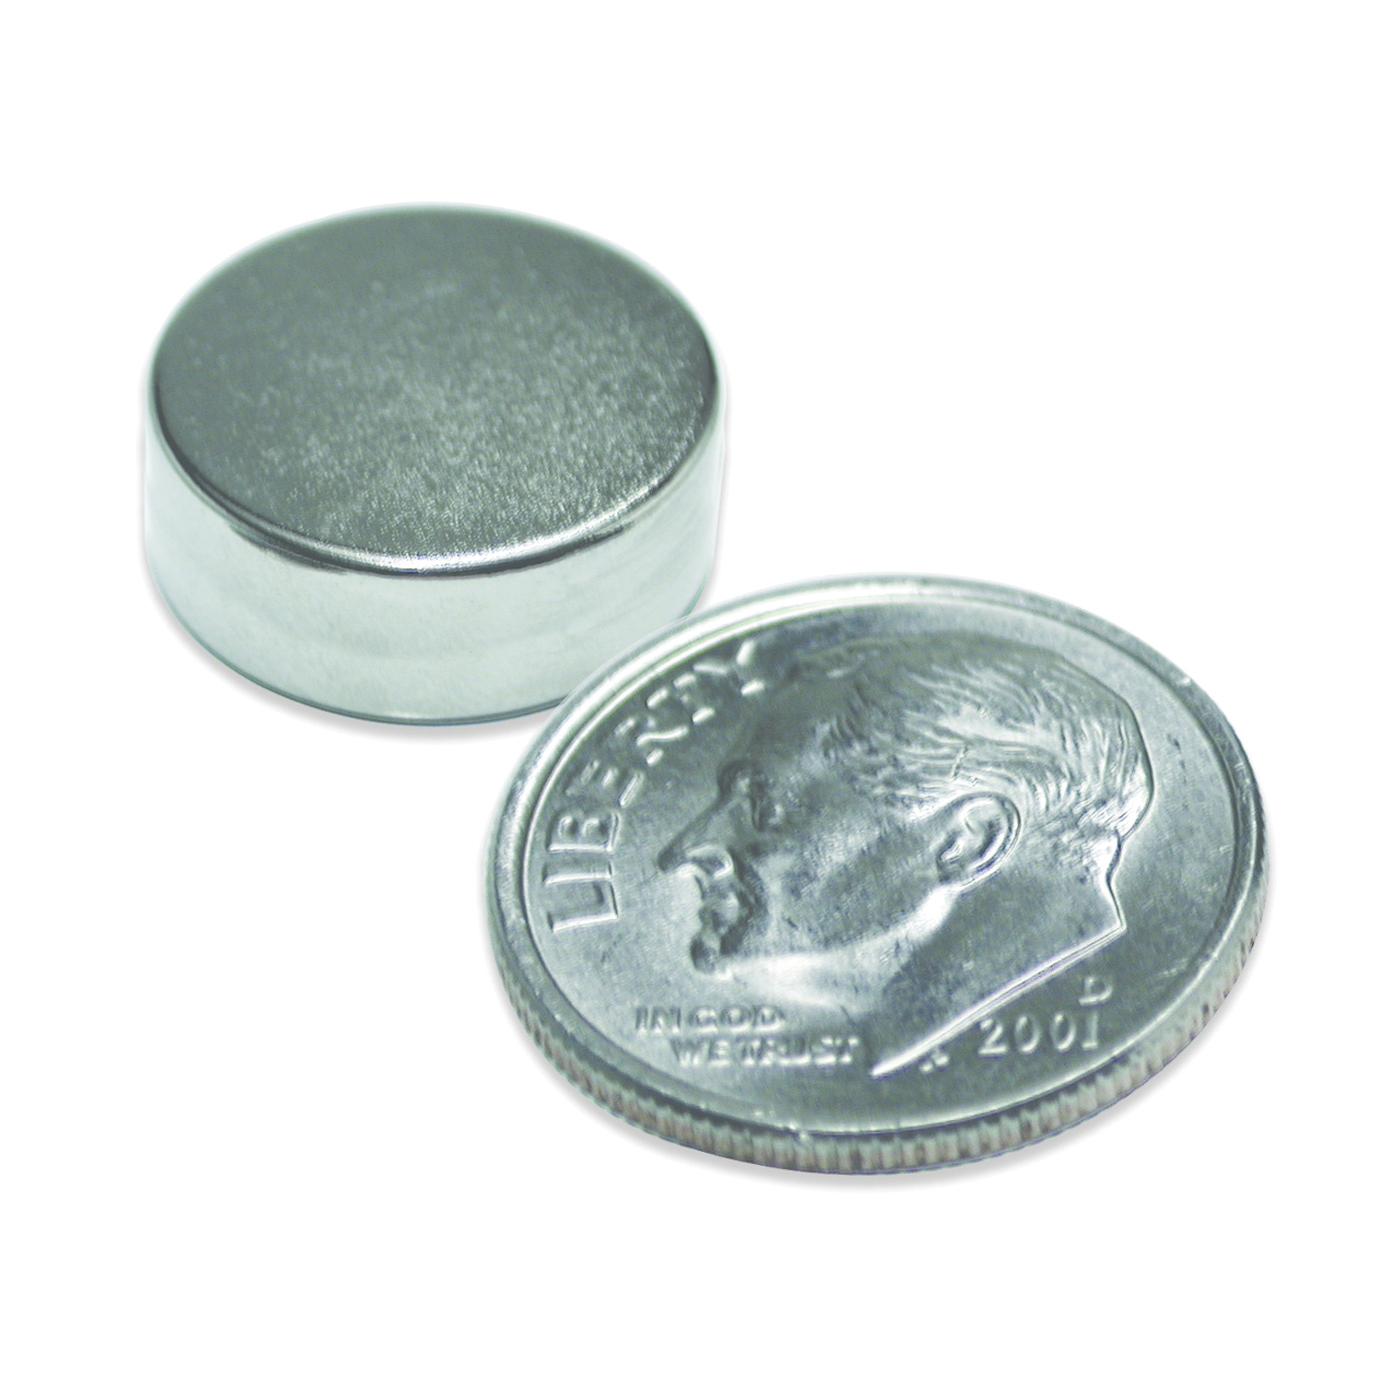 Picture of Magnet Source 07045 Super Magnetic Disc, Neodymium, 0.315 in Dia, 0.118 in H